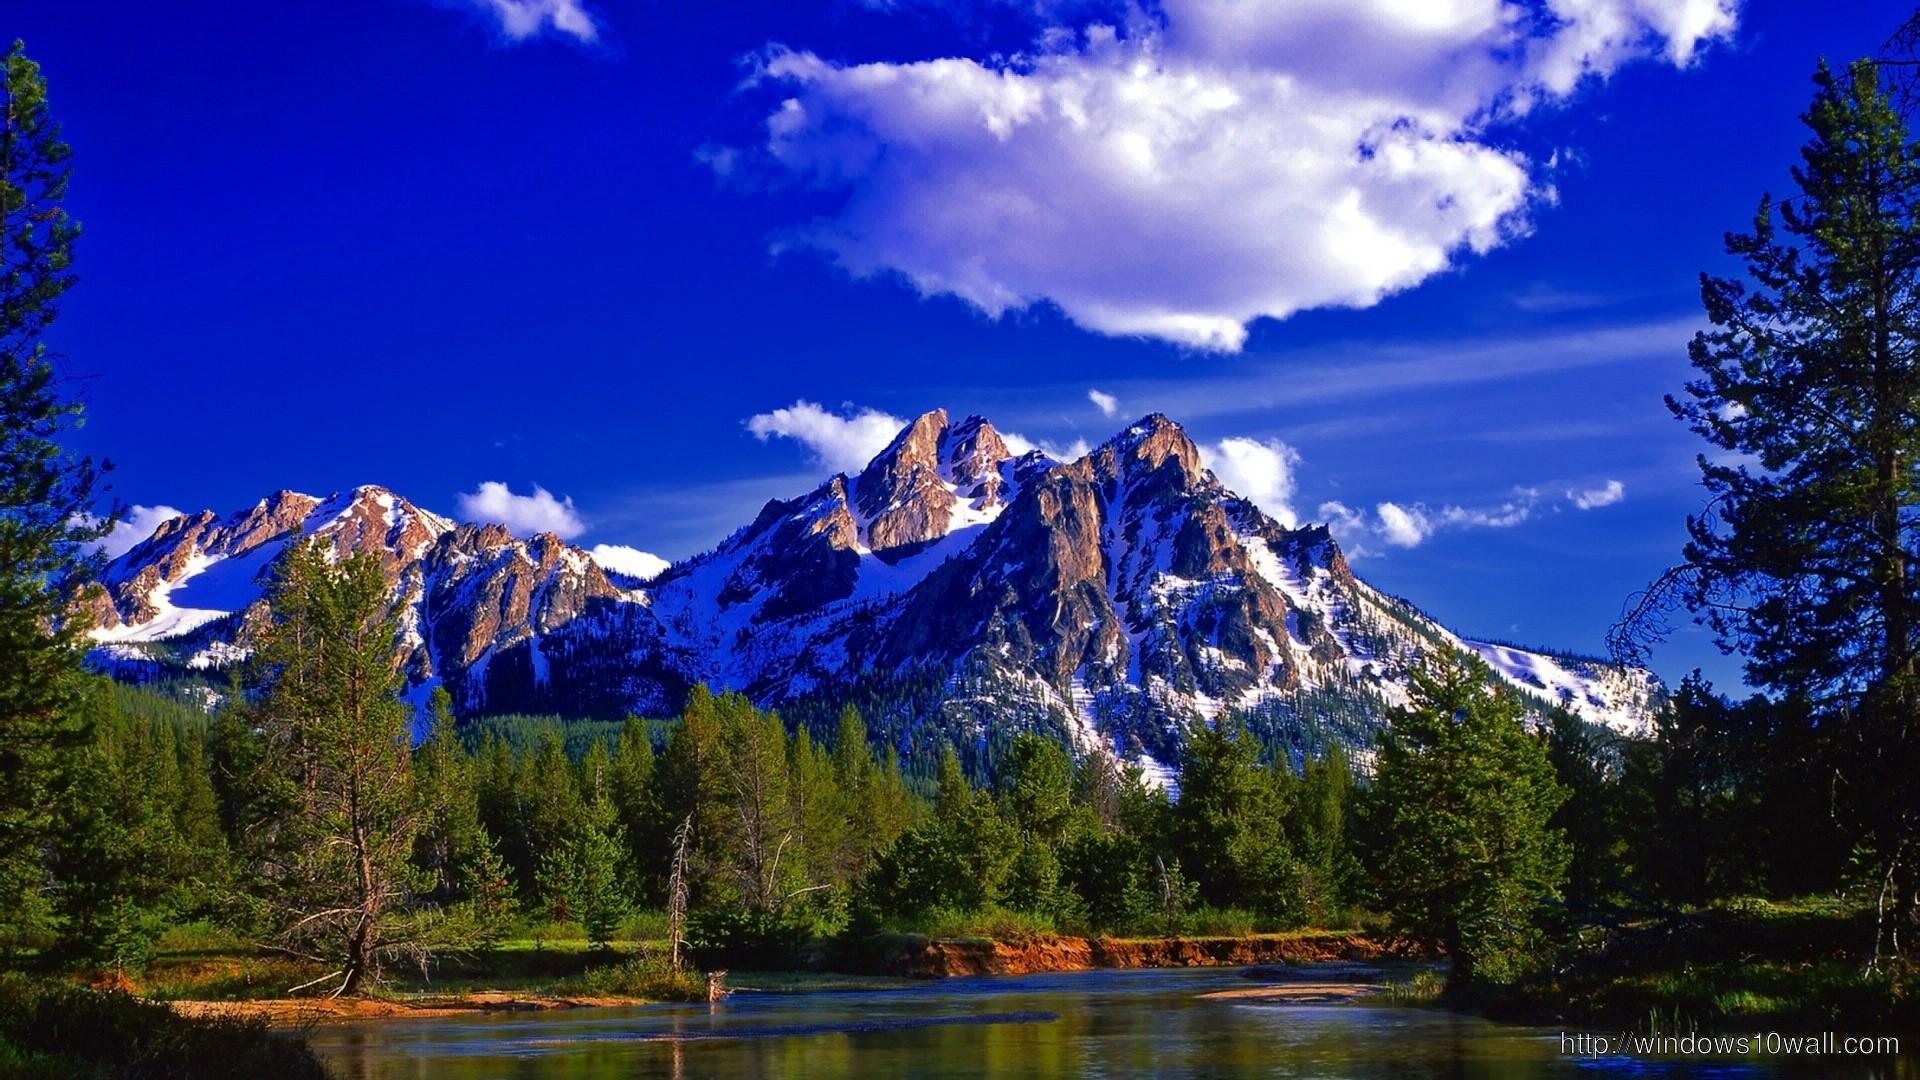 Windows 10 Wallpaper Mountains 74 Images